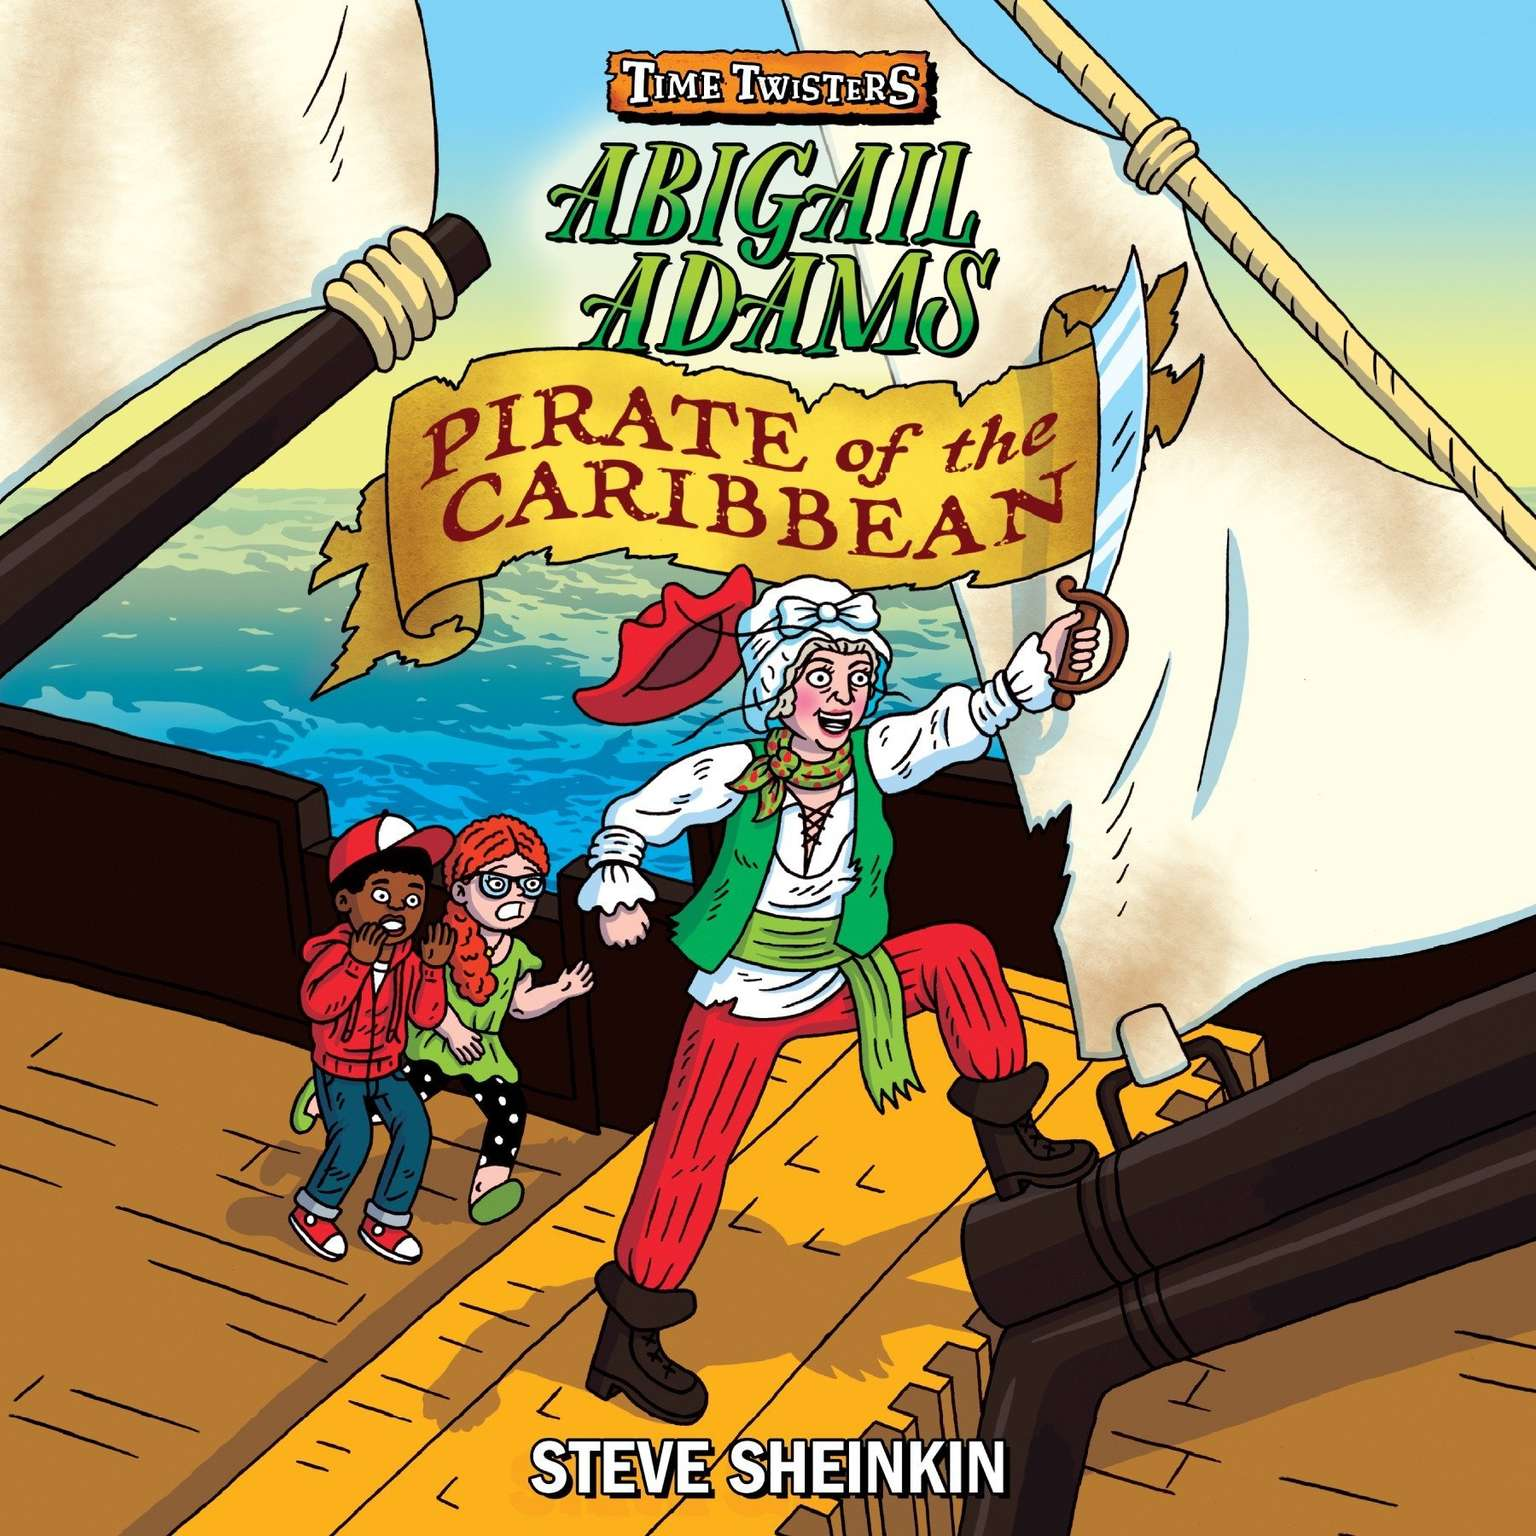 Abigail Adams, Pirate of the Caribbean Audiobook, by Steve Sheinkin